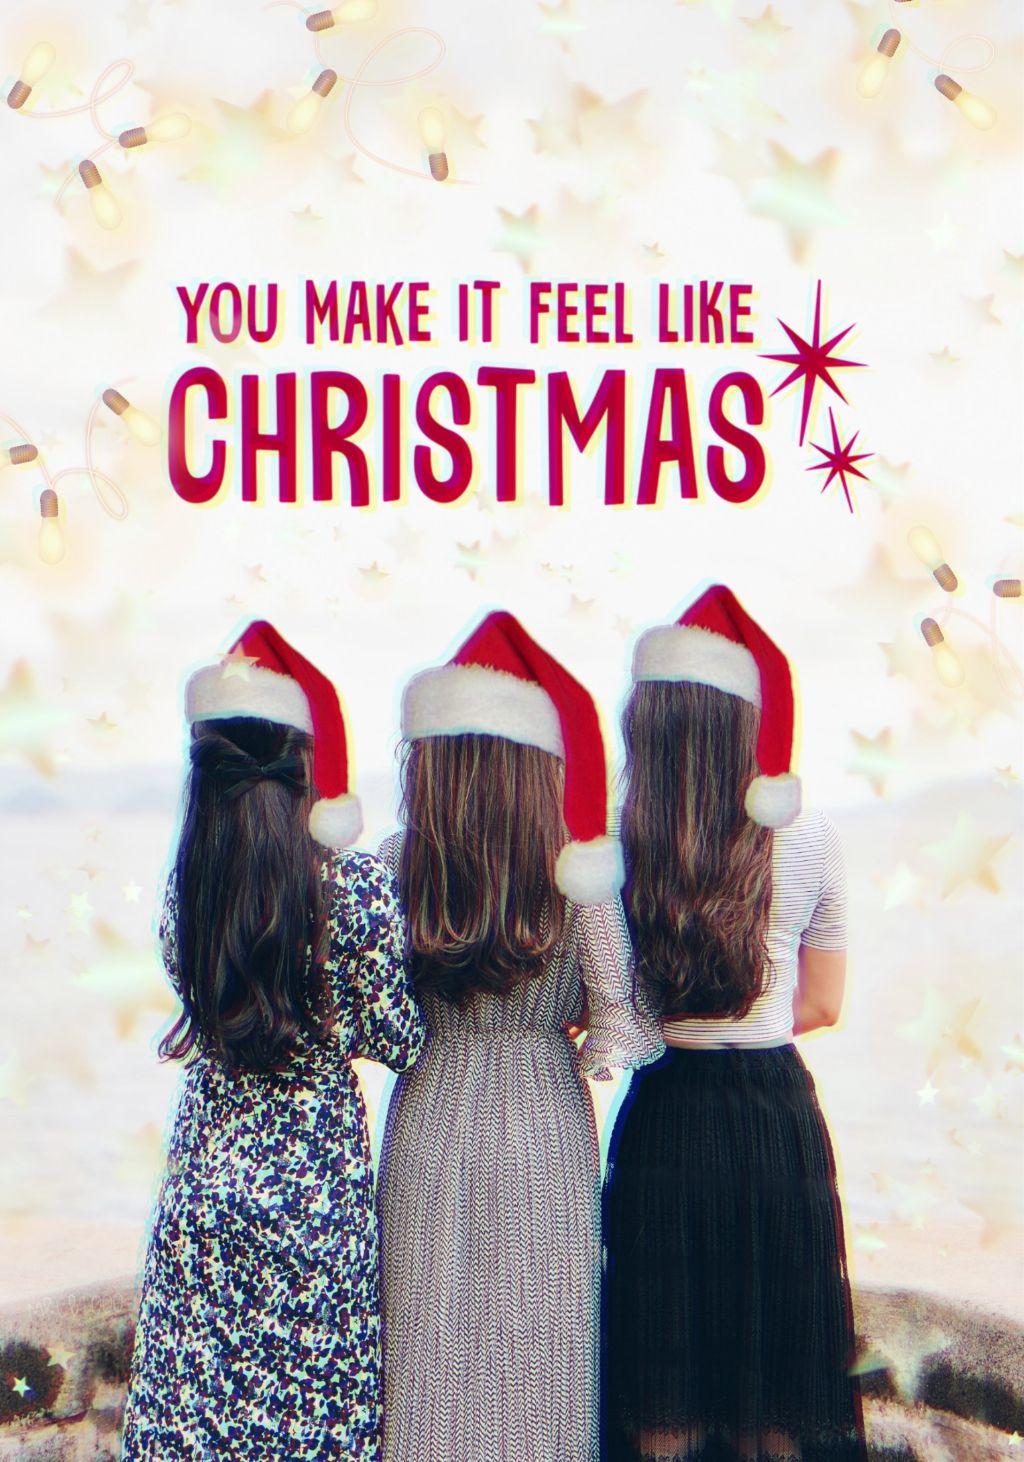 #freetoedit#december#remixit#xmas#girls#woman#wonderful#beautiful#santa#stars#snow#santaclaus#mrlb2000#xmas2019#lol#nice#myart#myedit#madewithpicsart @pa @freetoedit